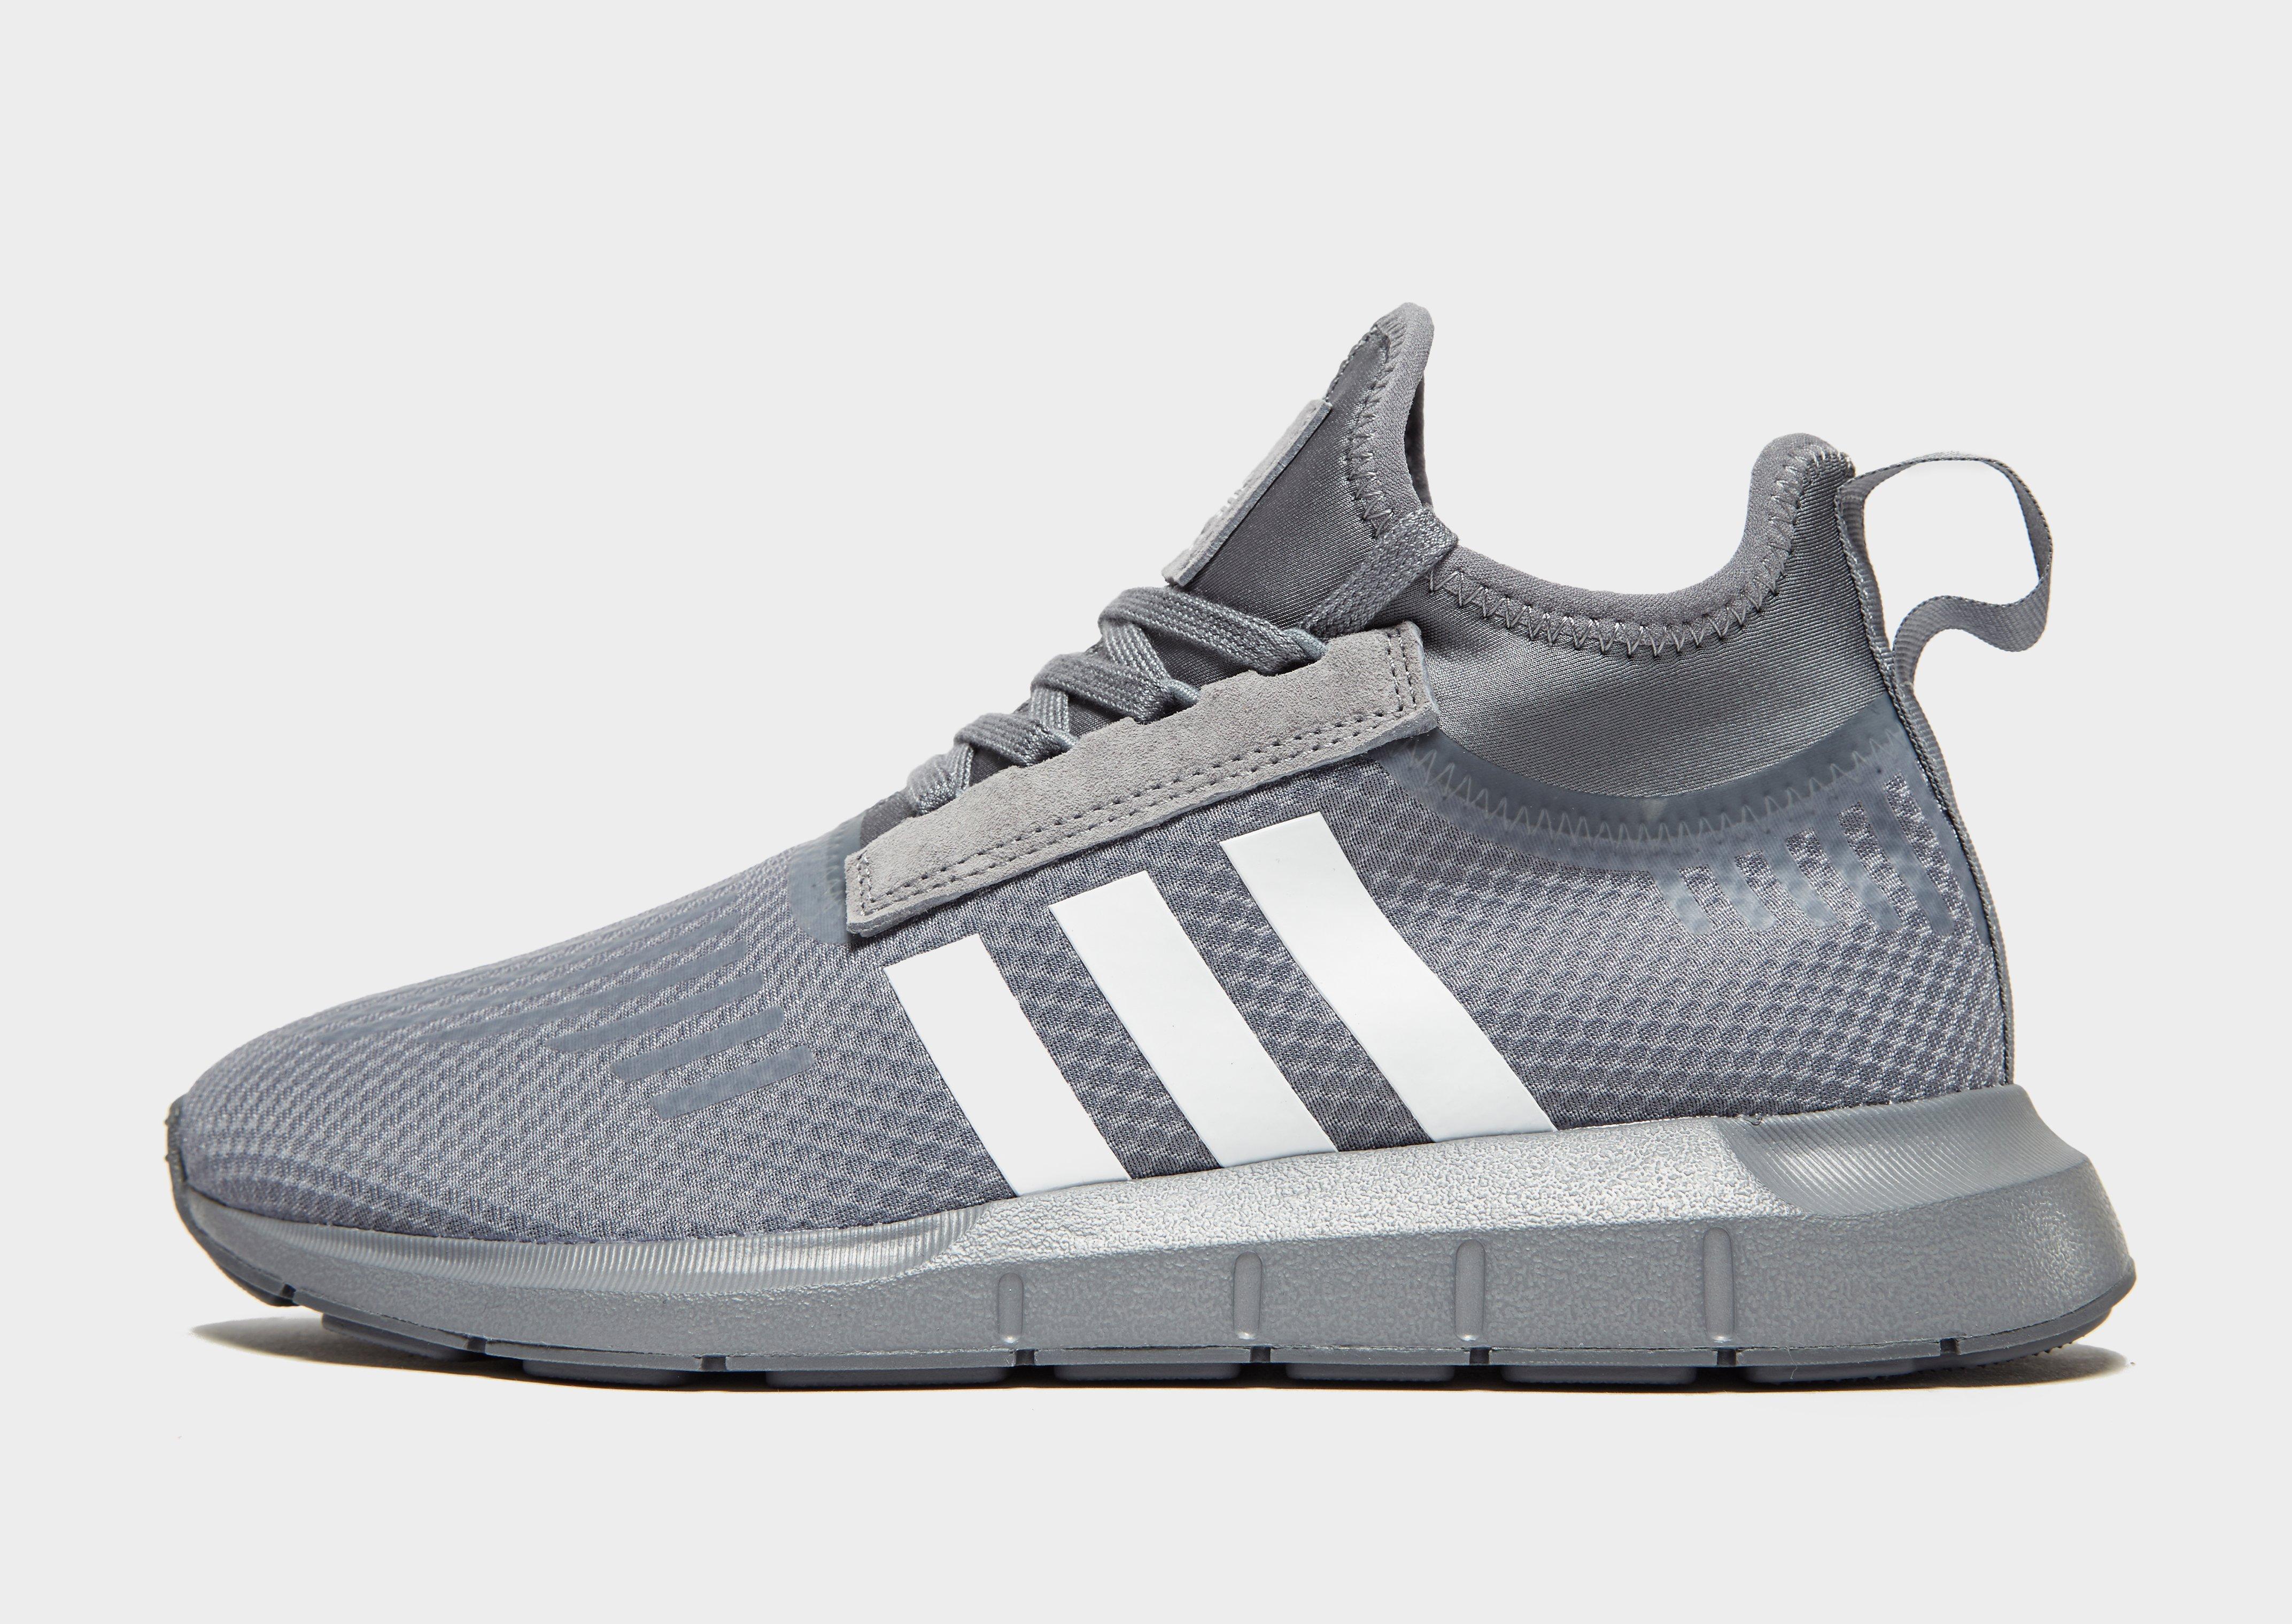 d2dabfd4b3693 Lyst - adidas Swift Run Barrier Shoes in Gray for Men